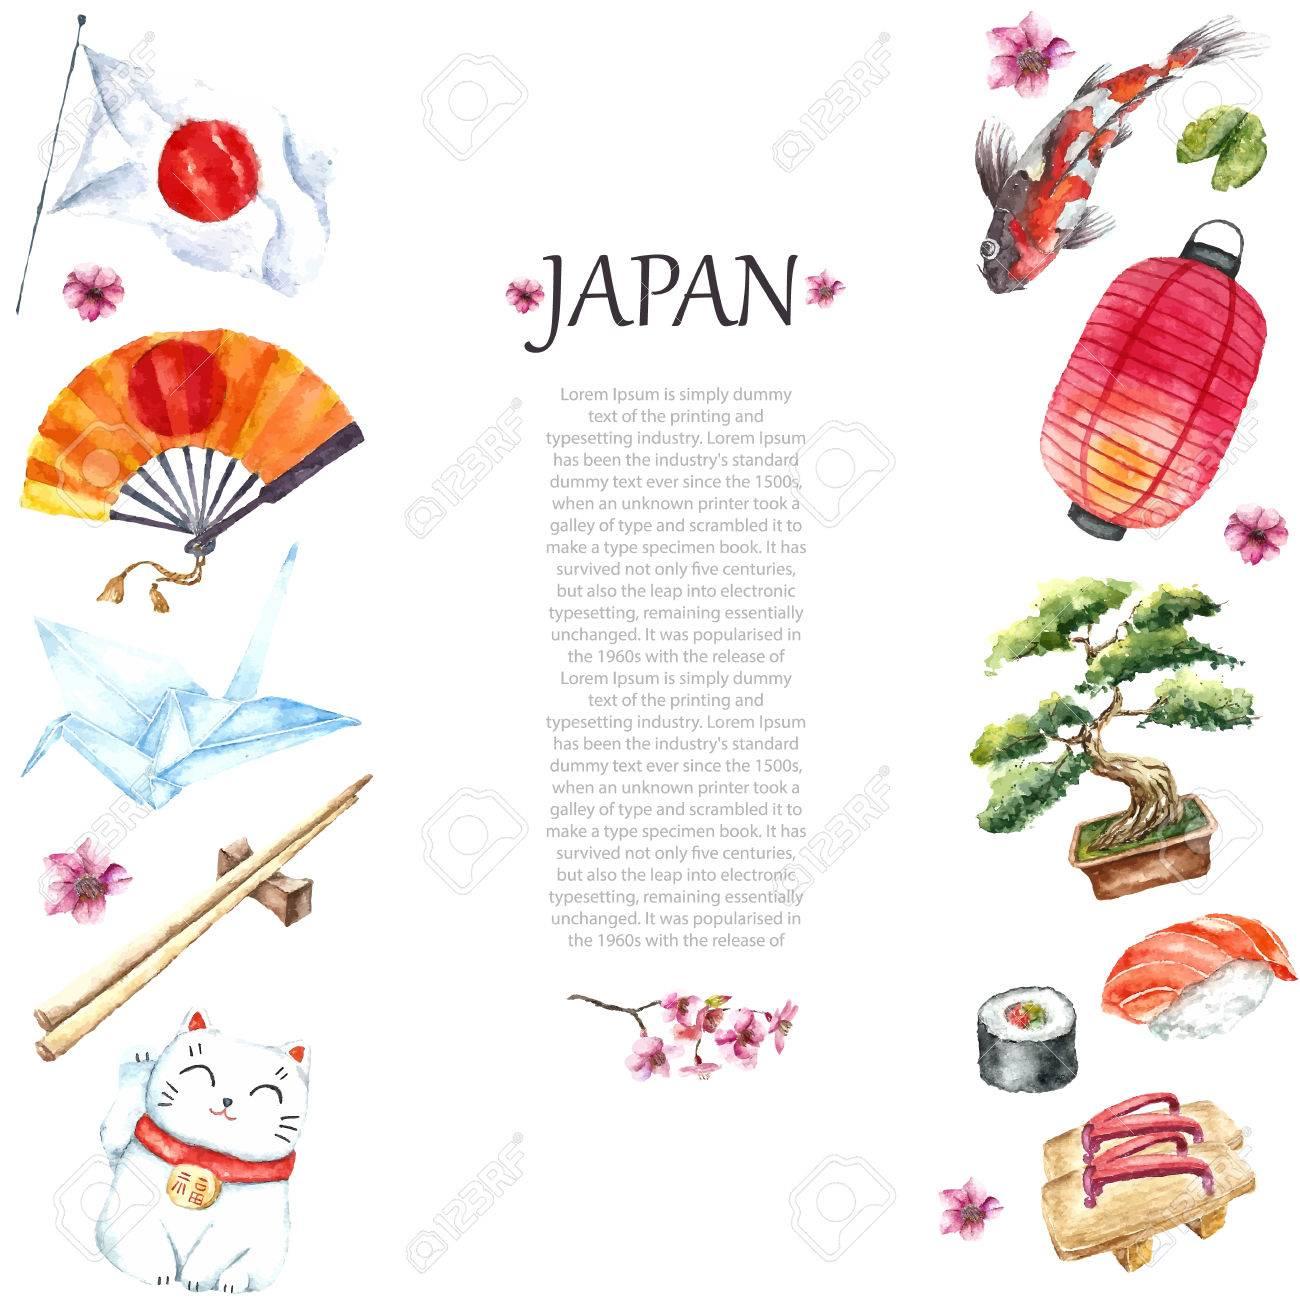 Watercolor japanese frame frame with hand draw japanese objects frame with hand draw japanese objectstorii gateorigami bird jeuxipadfo Choice Image